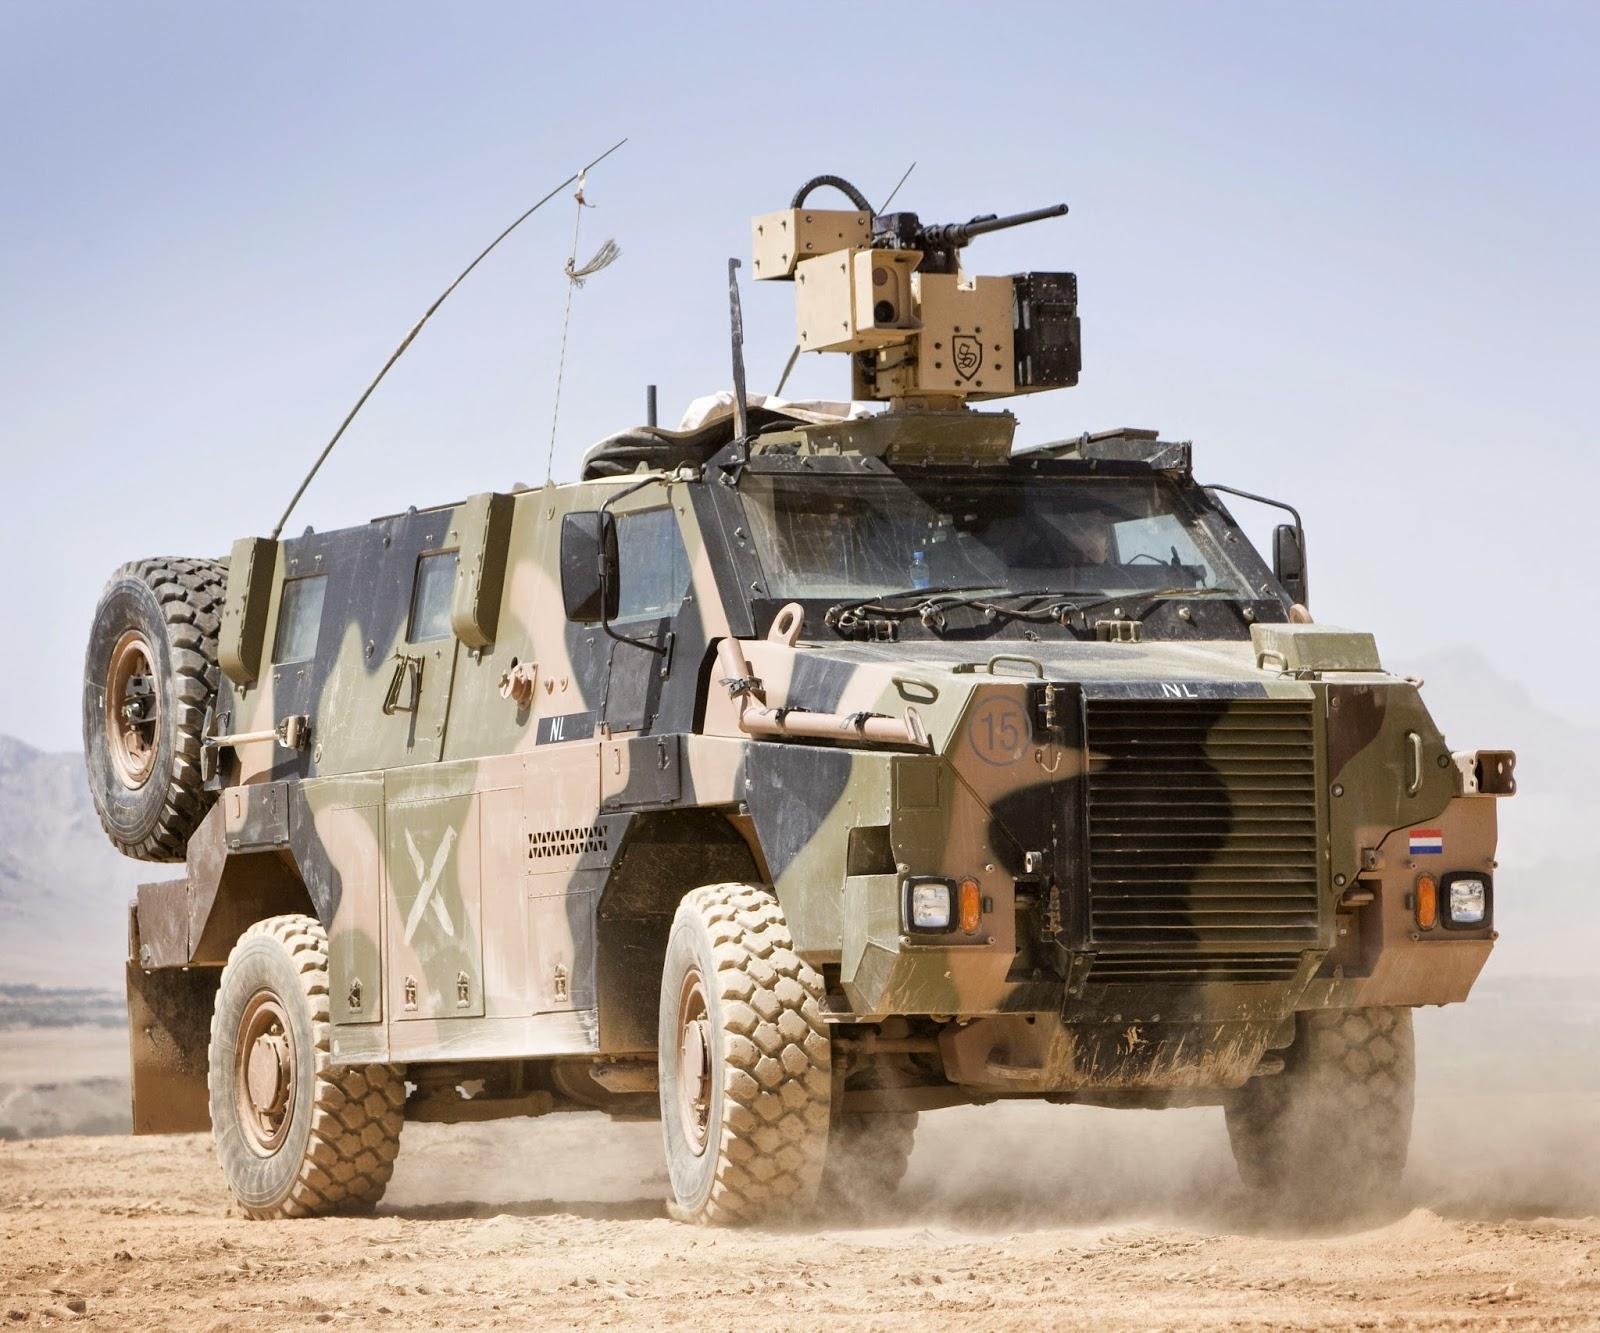 Bushmaster PMV